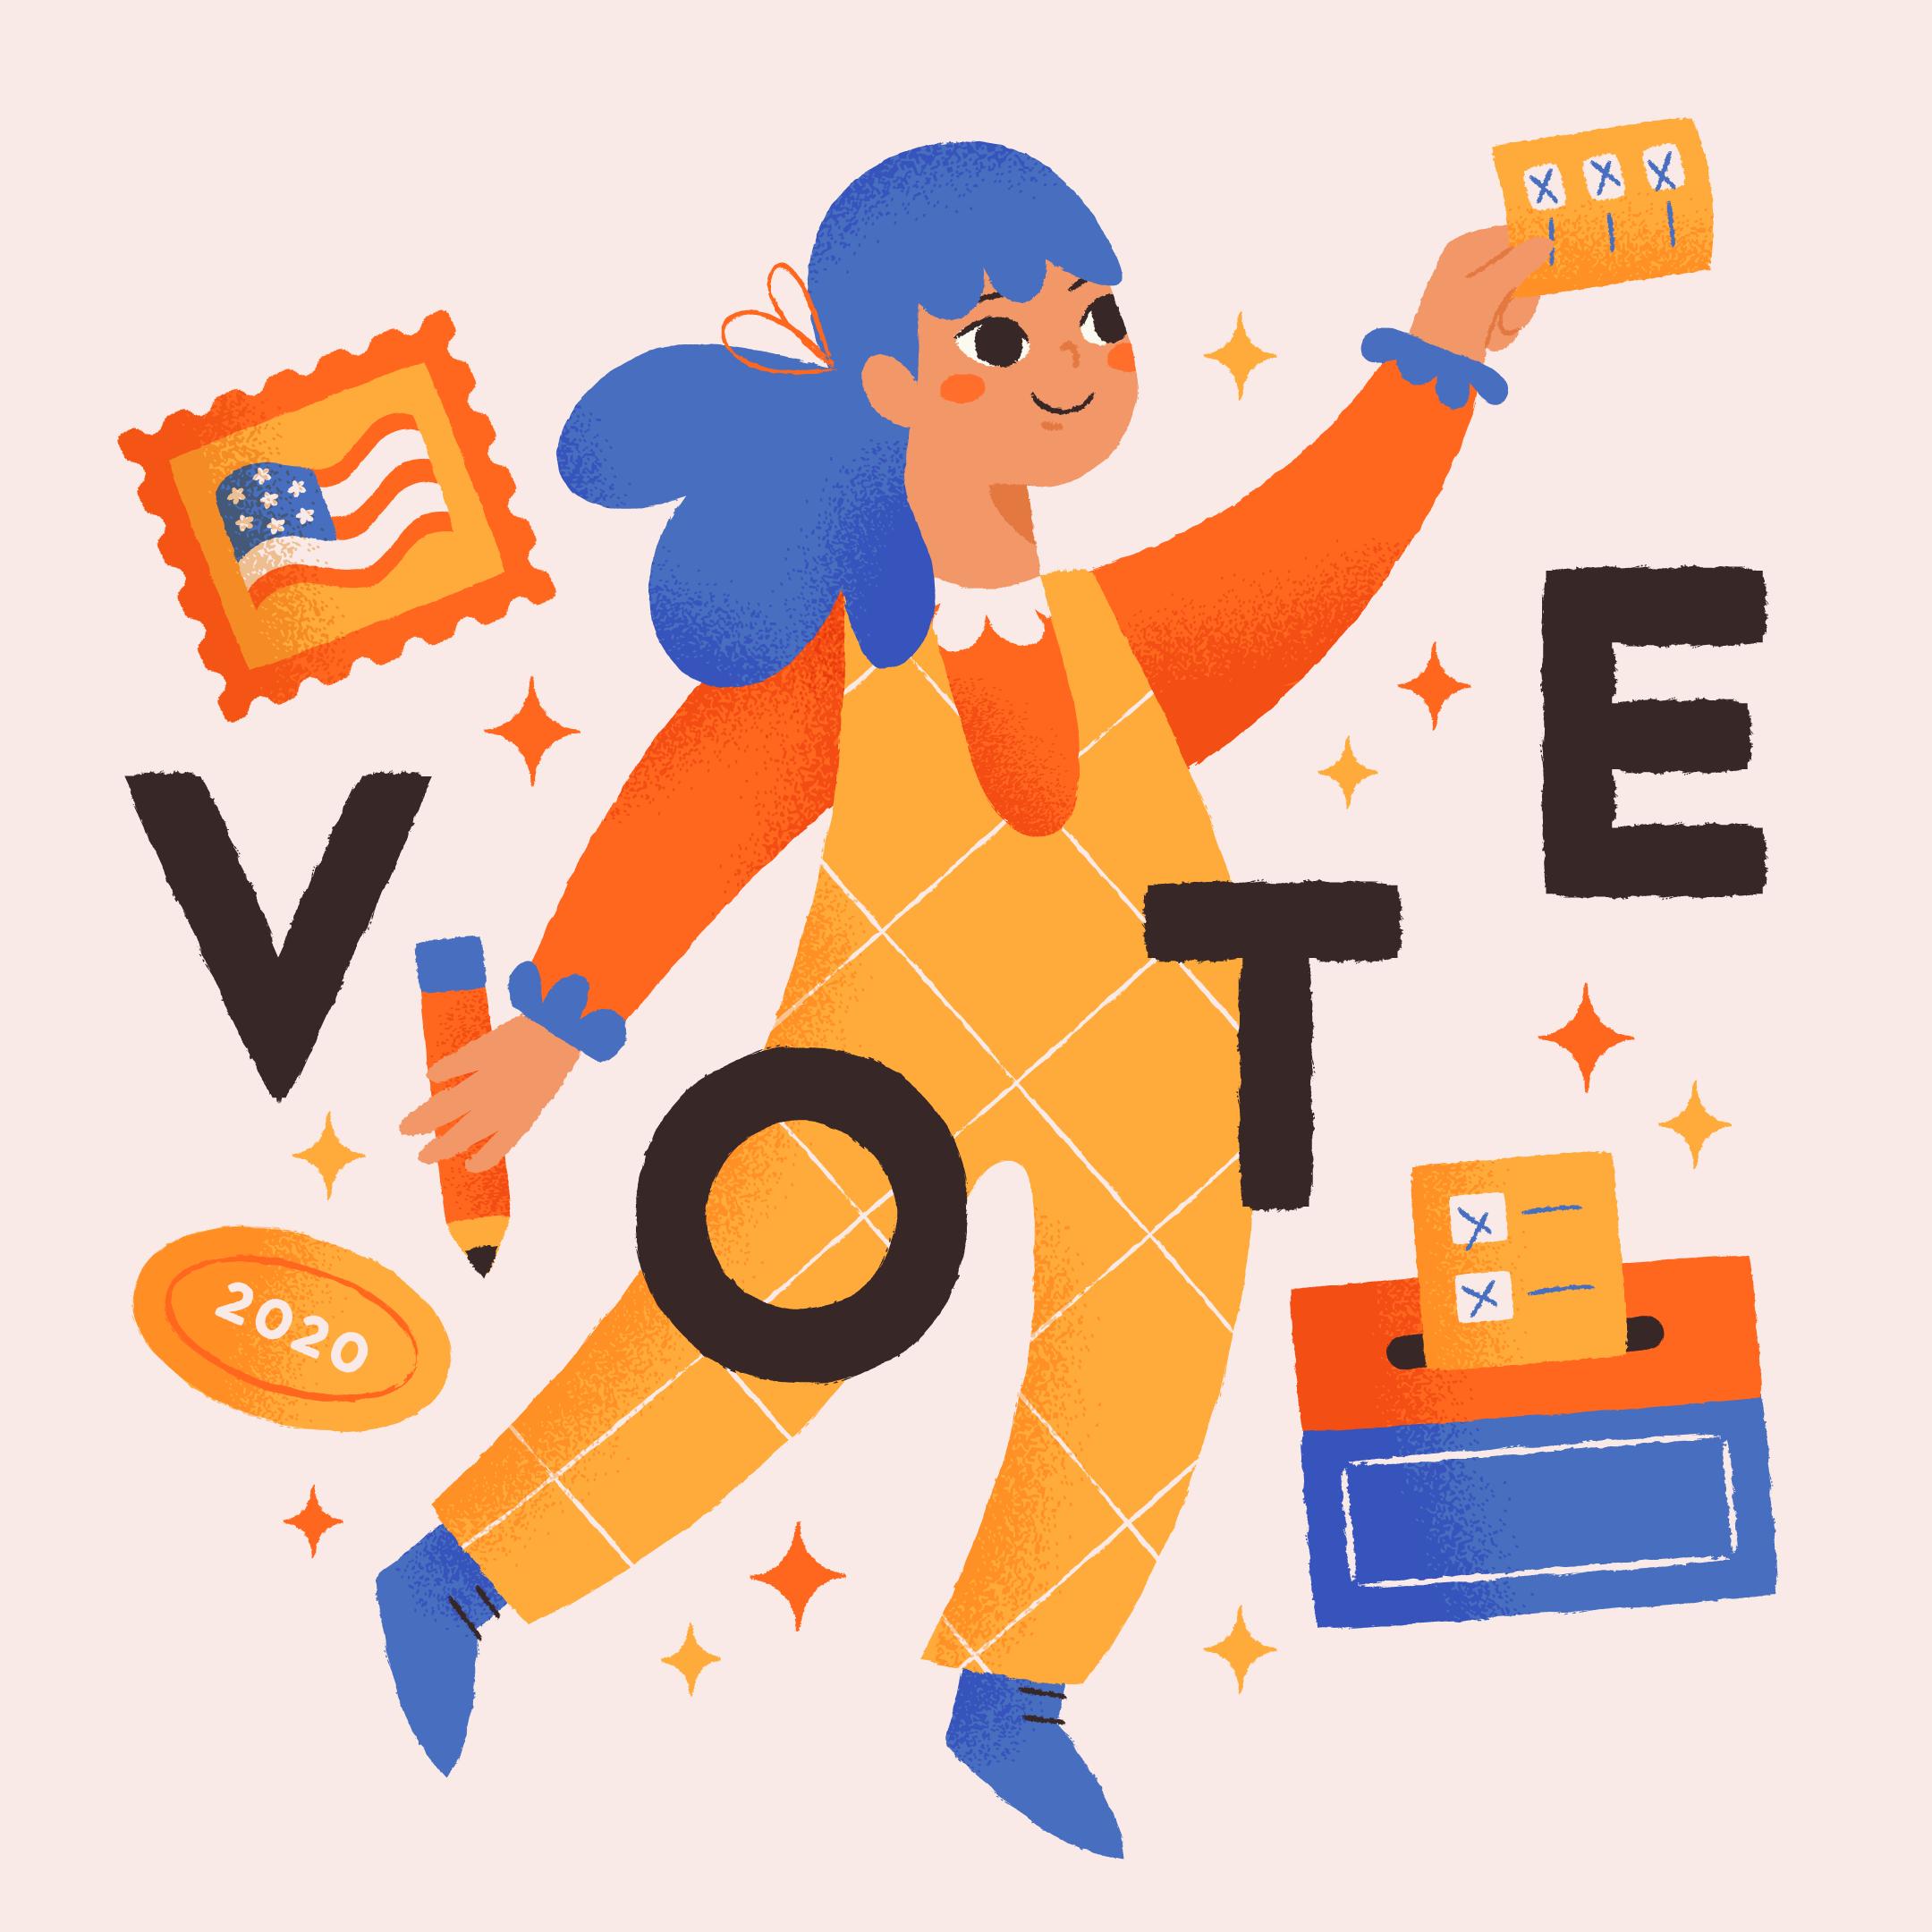 68_vote